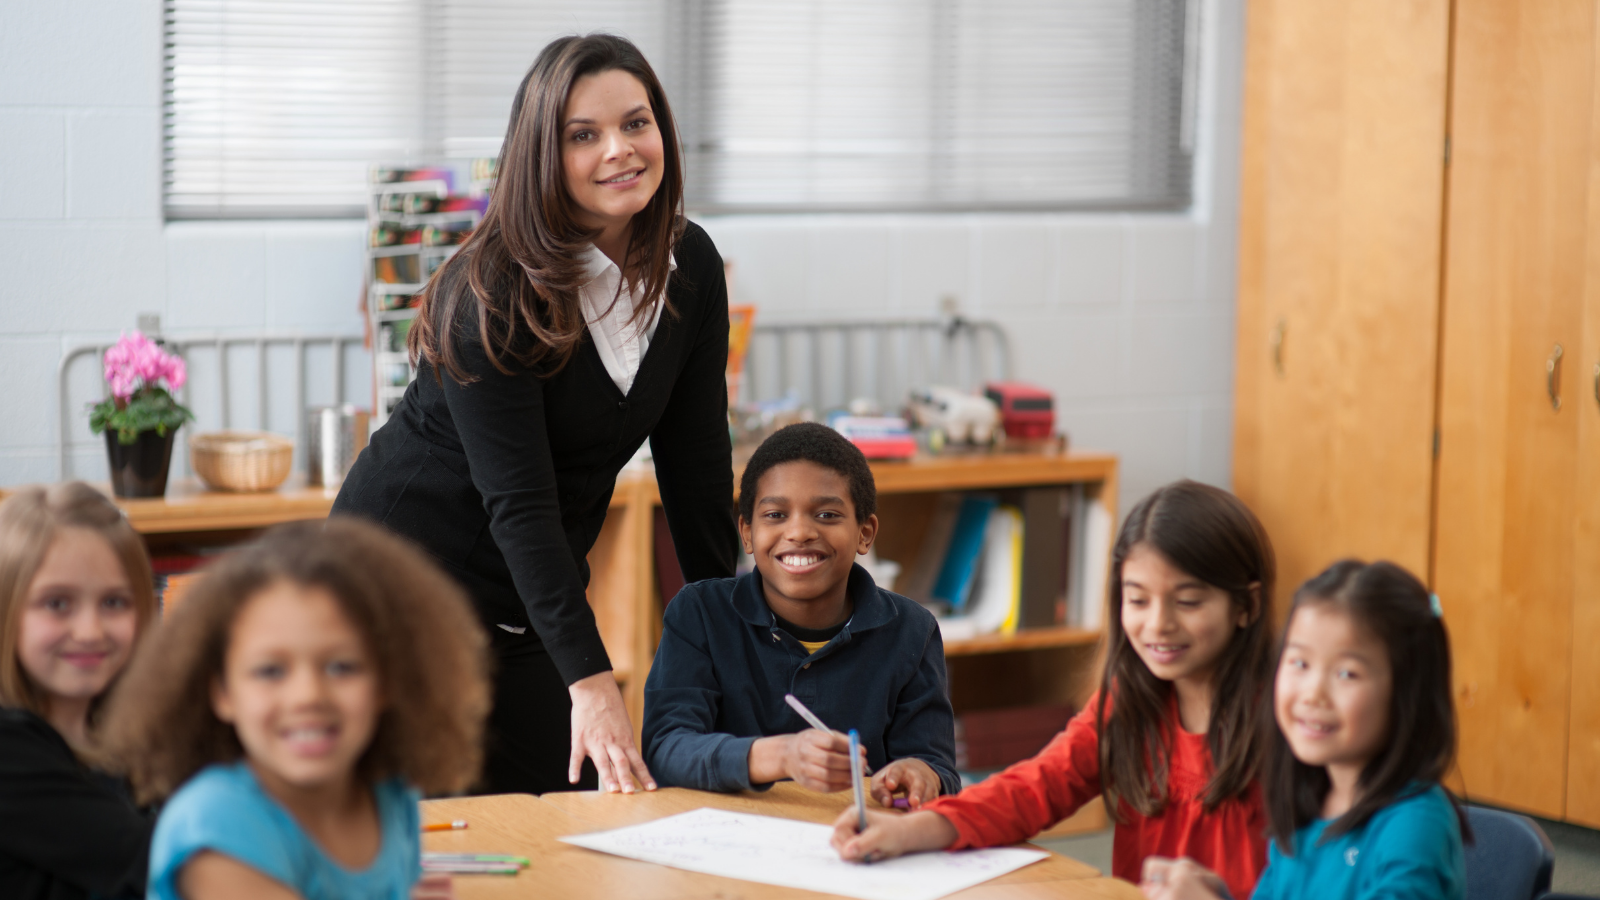 Teacher focusing on teaching